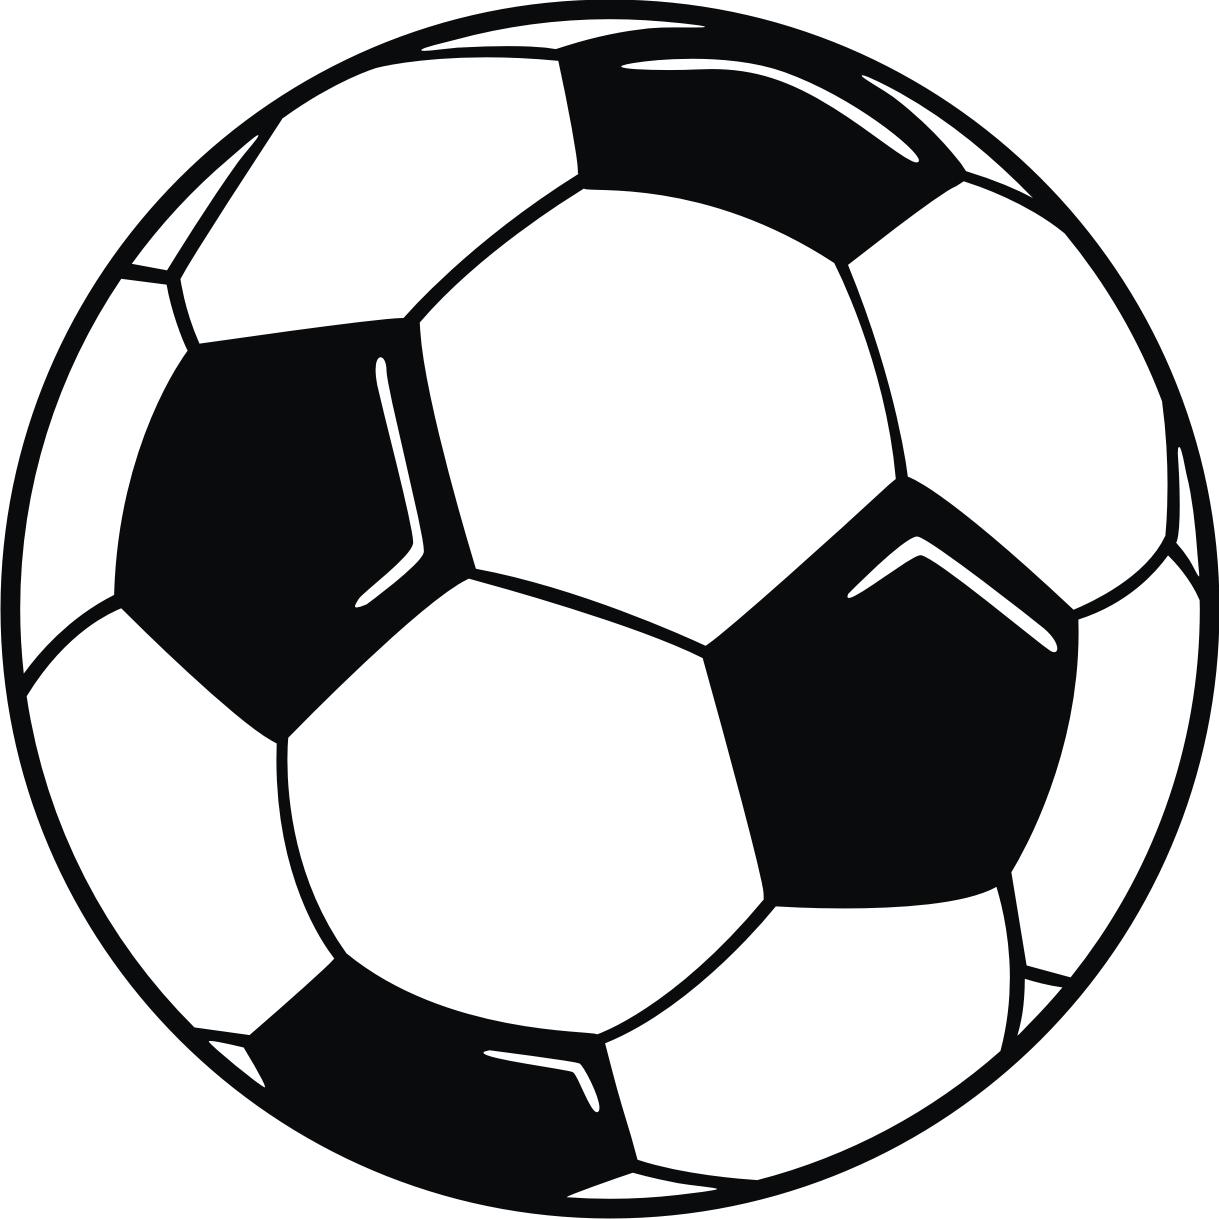 1219x1219 Soccer Ball Border Clip Art Free Clipart Images